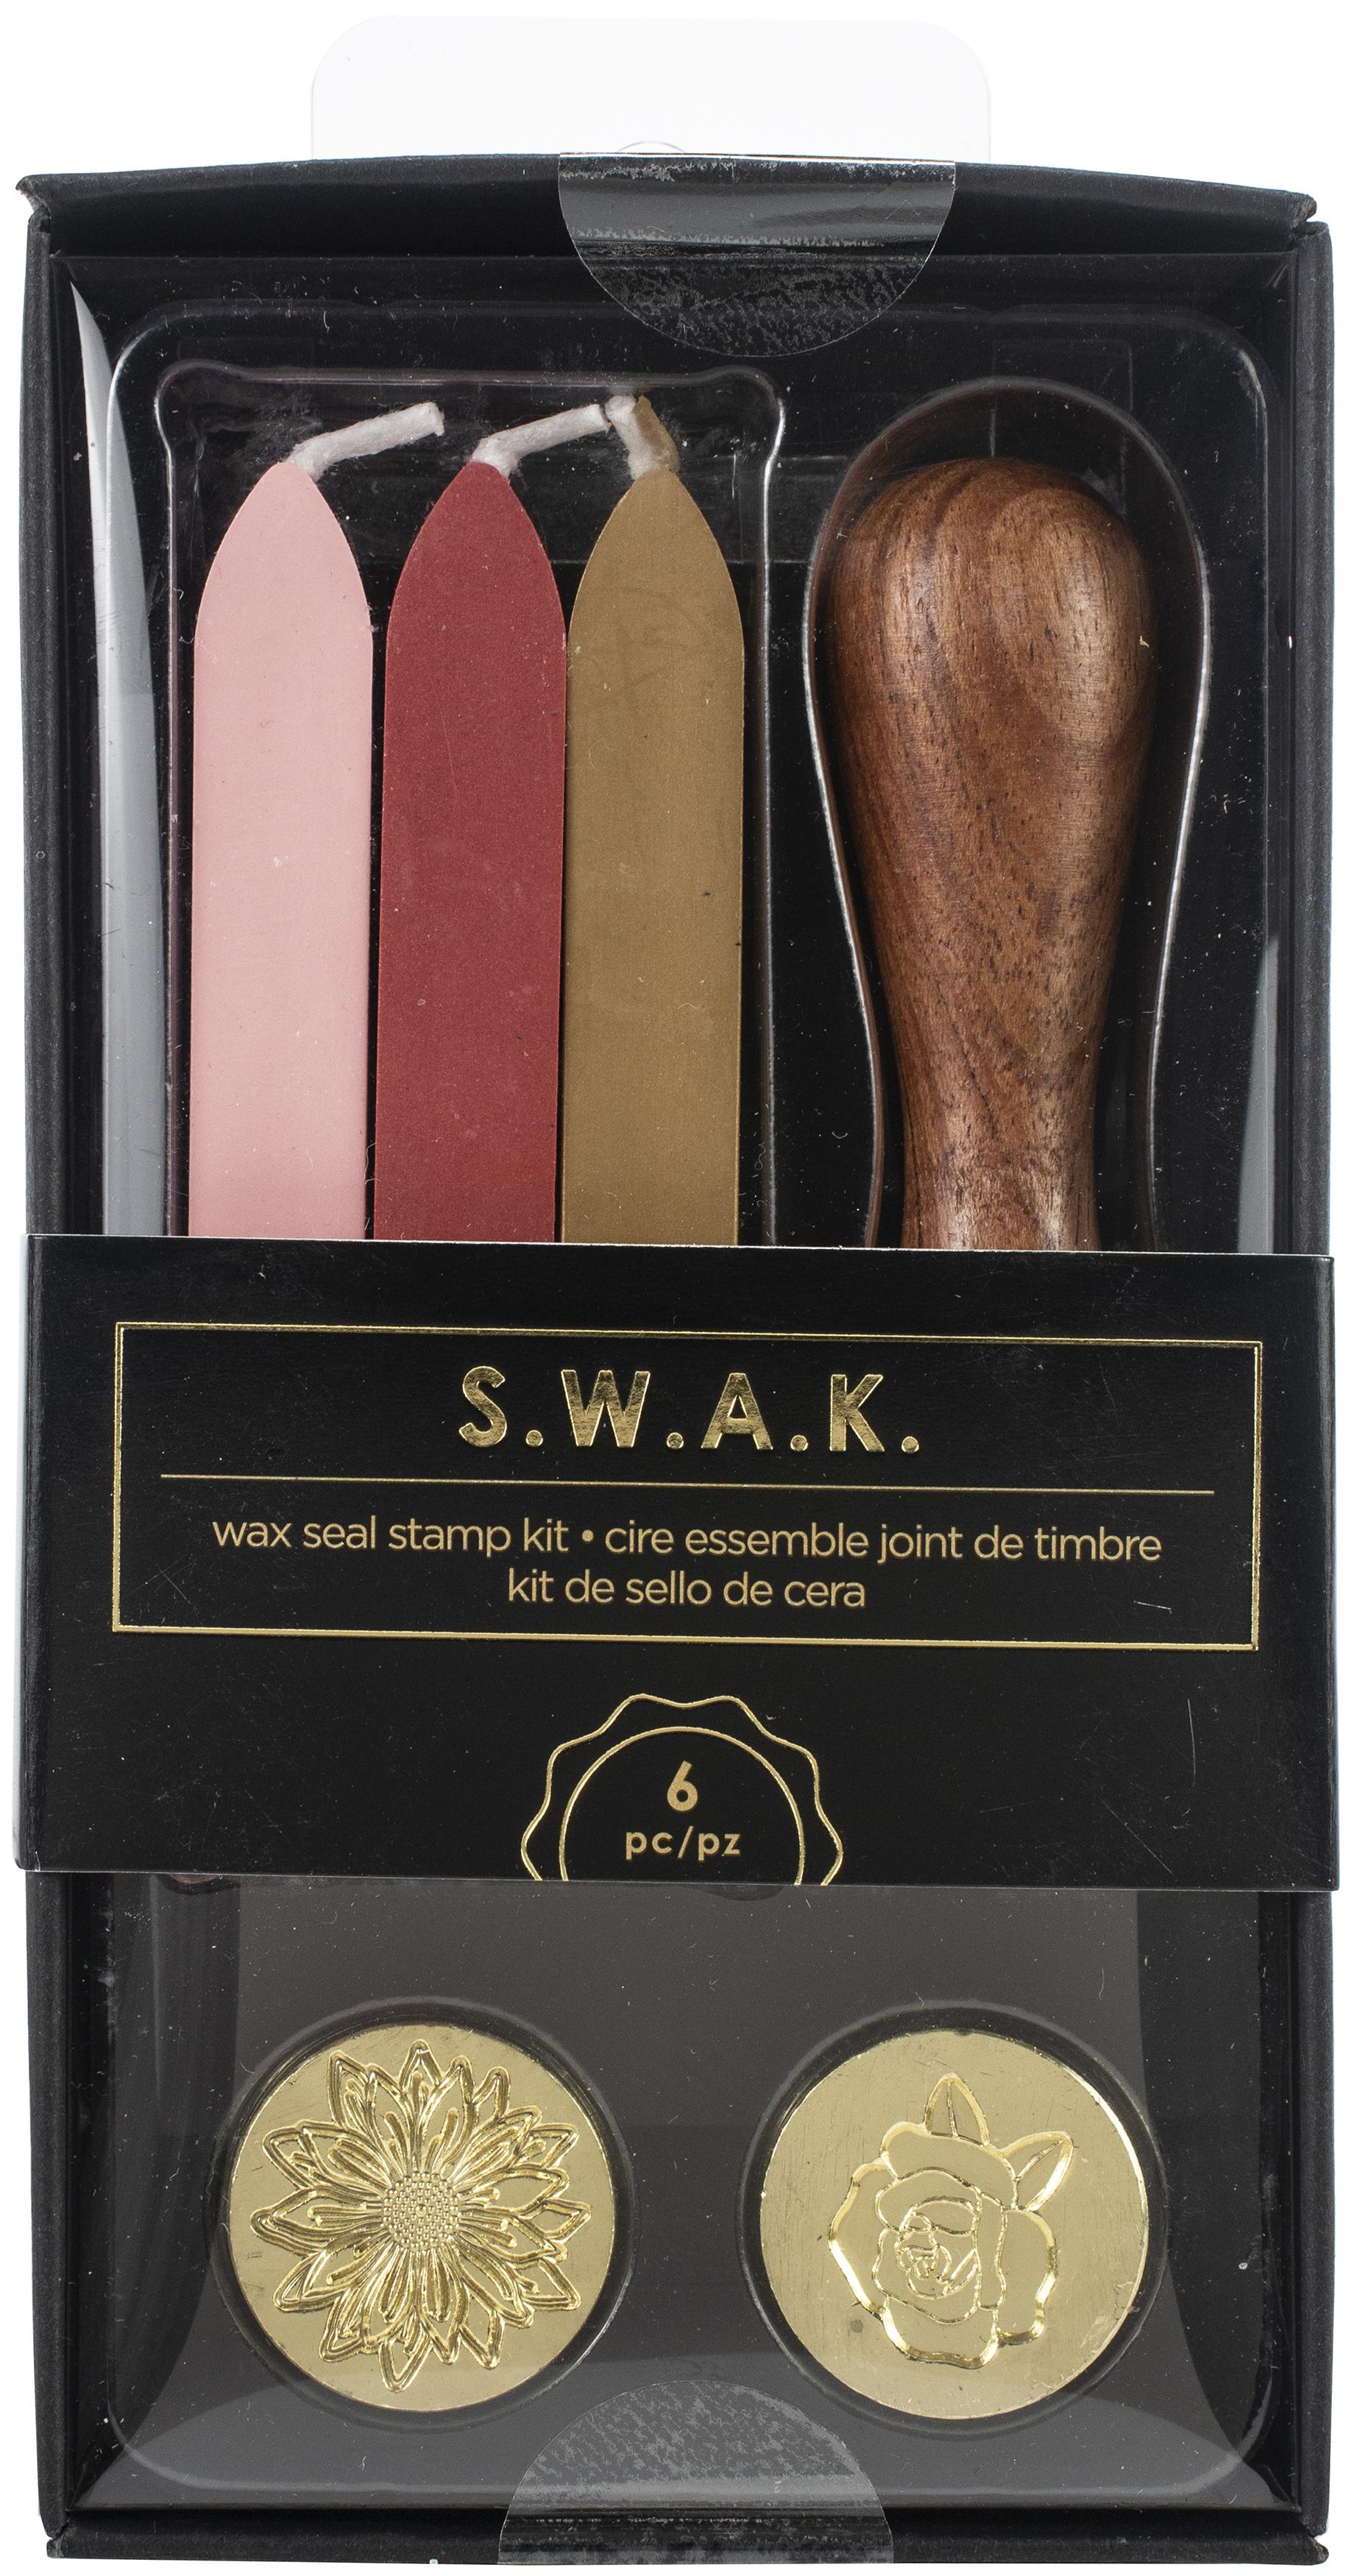 American Crafts S.W.A.K. Wax Seal Kit 6/Pkg-Sunflower/Rose